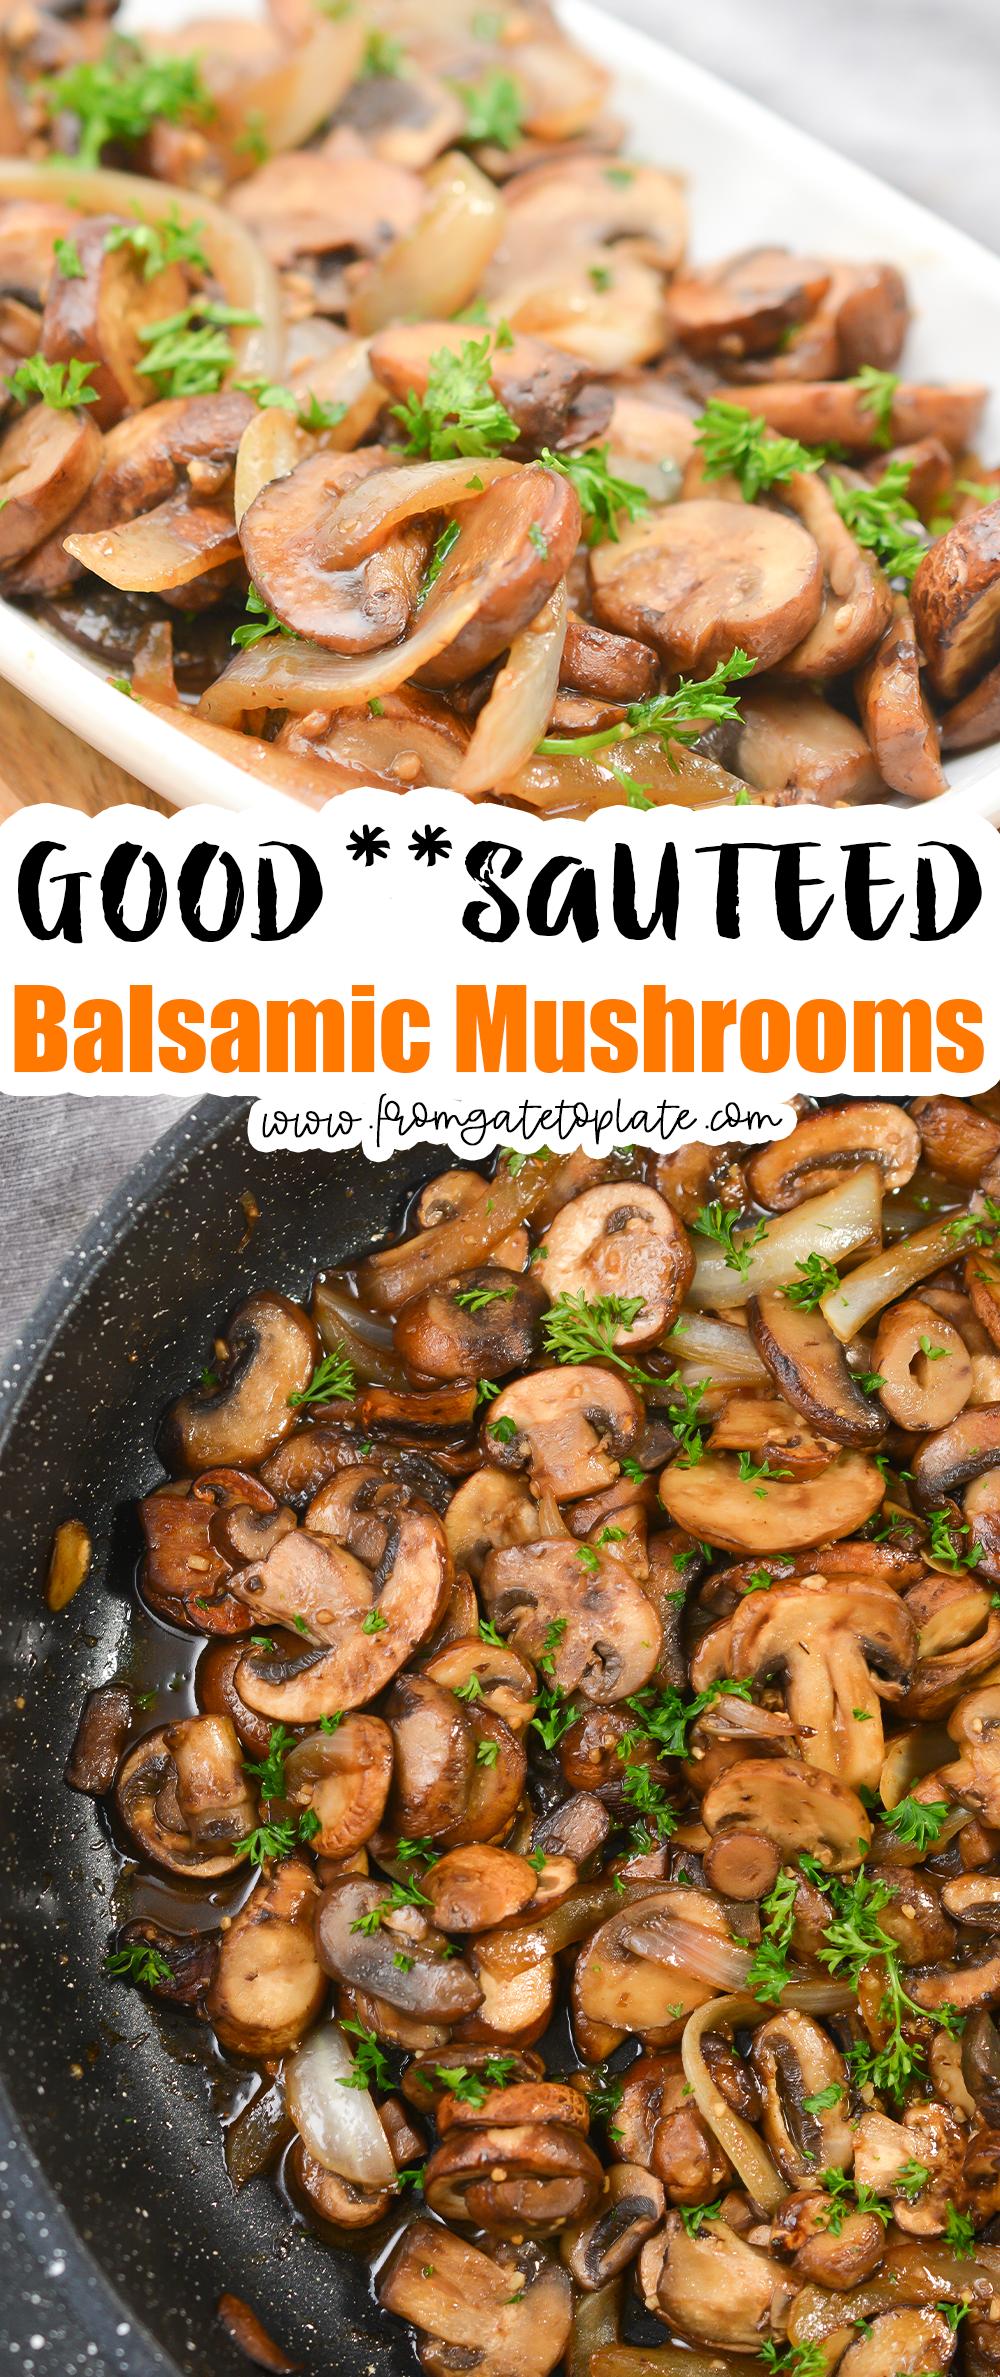 Sauteed Balsamic Mushrooms